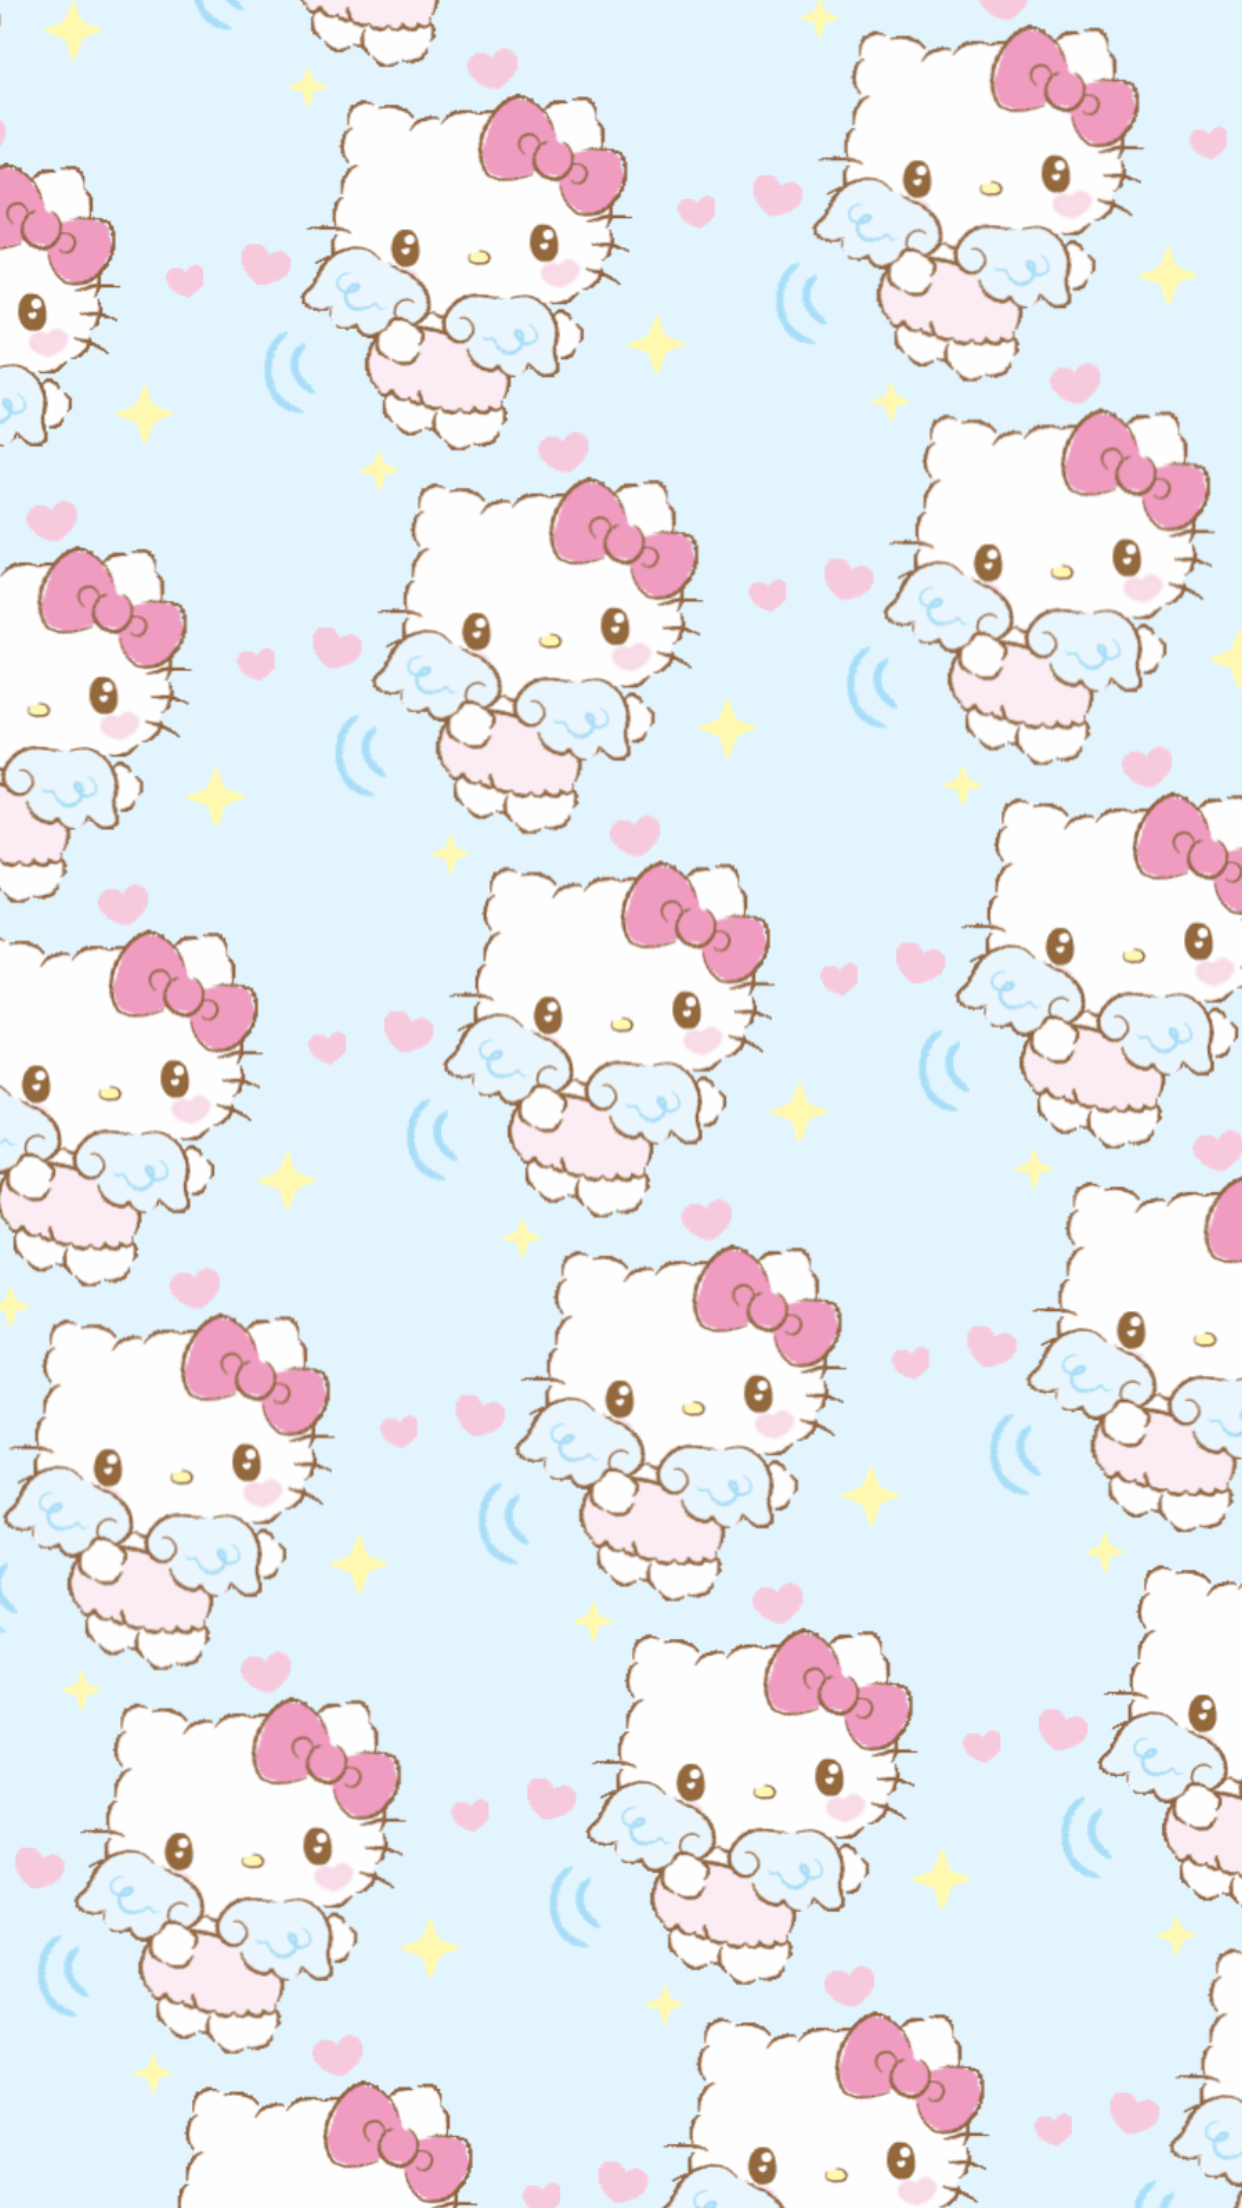 Pin By My Info On Hello Kitty Kitty Hello Kitty Baby Hello Kitty